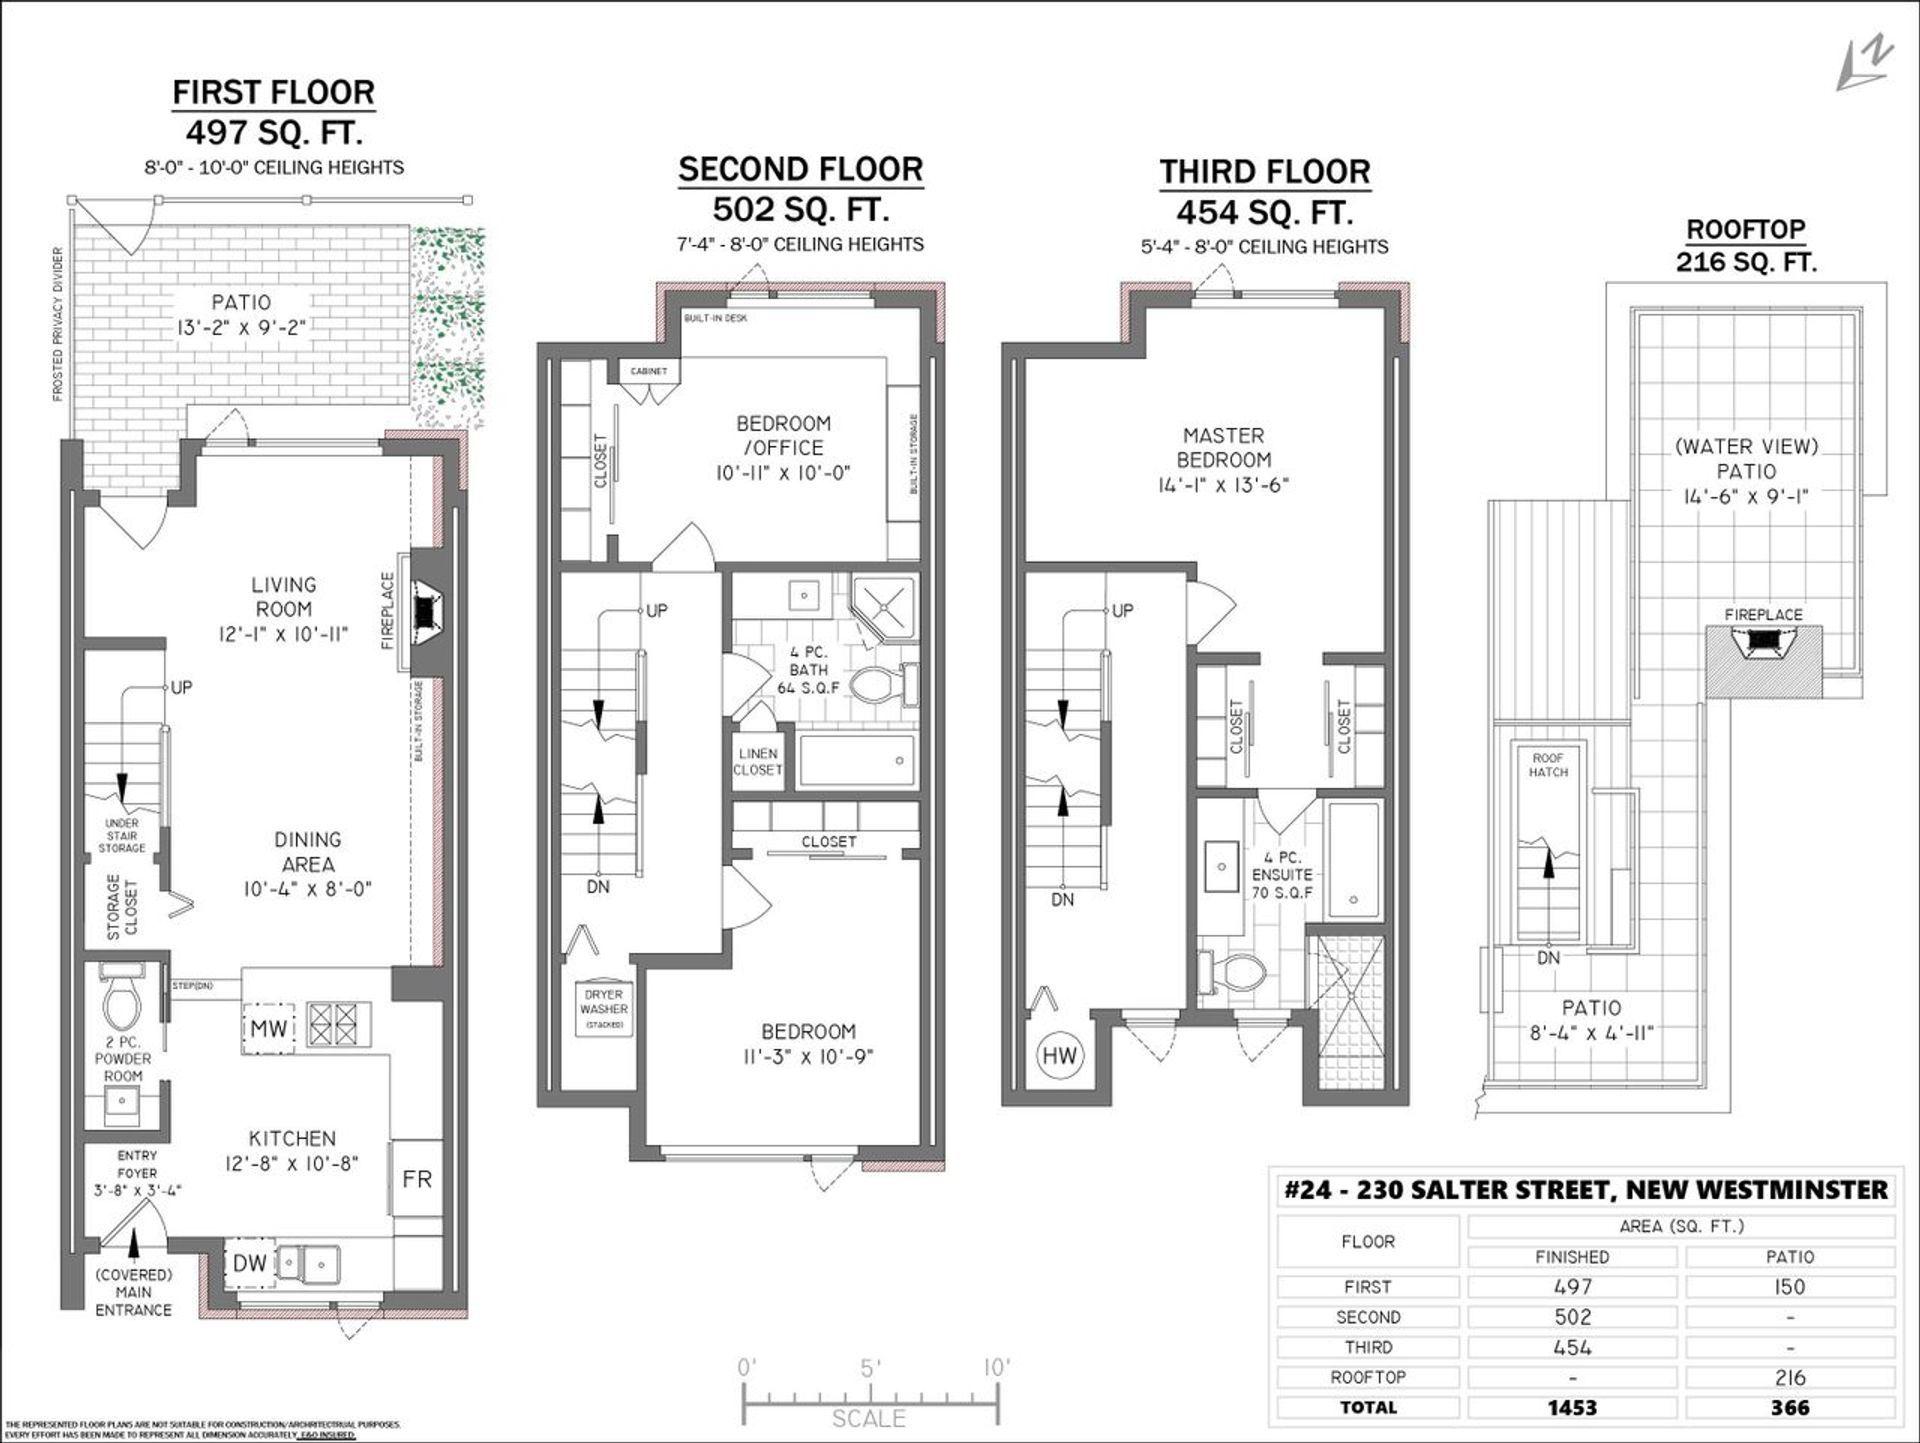 230-salter-street-queensborough-new-westminster-24-1 at 24 - 230 Salter Street, Queensborough, New Westminster